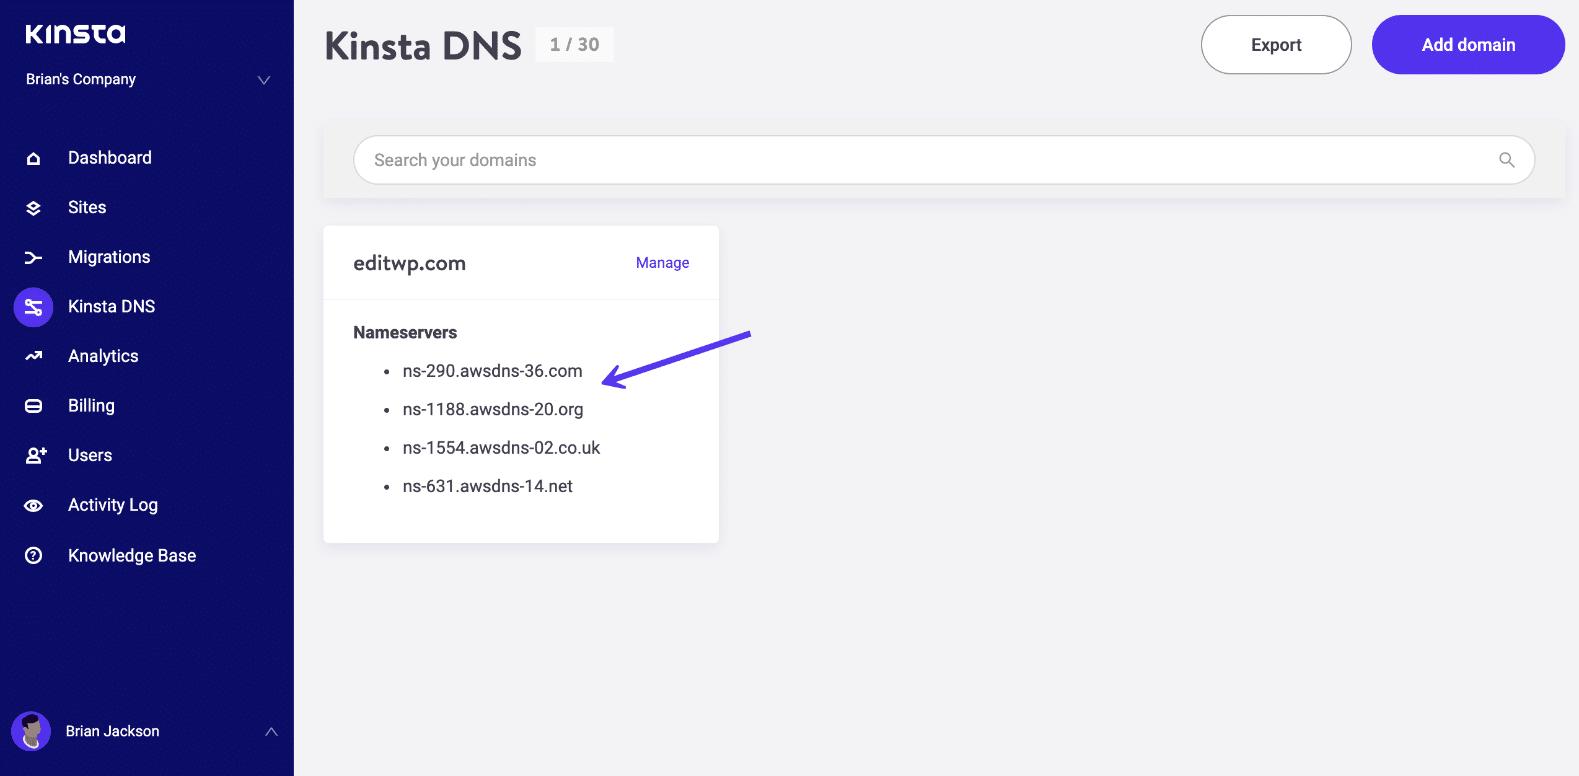 Ver Kinsta DNS - servidores de nomes